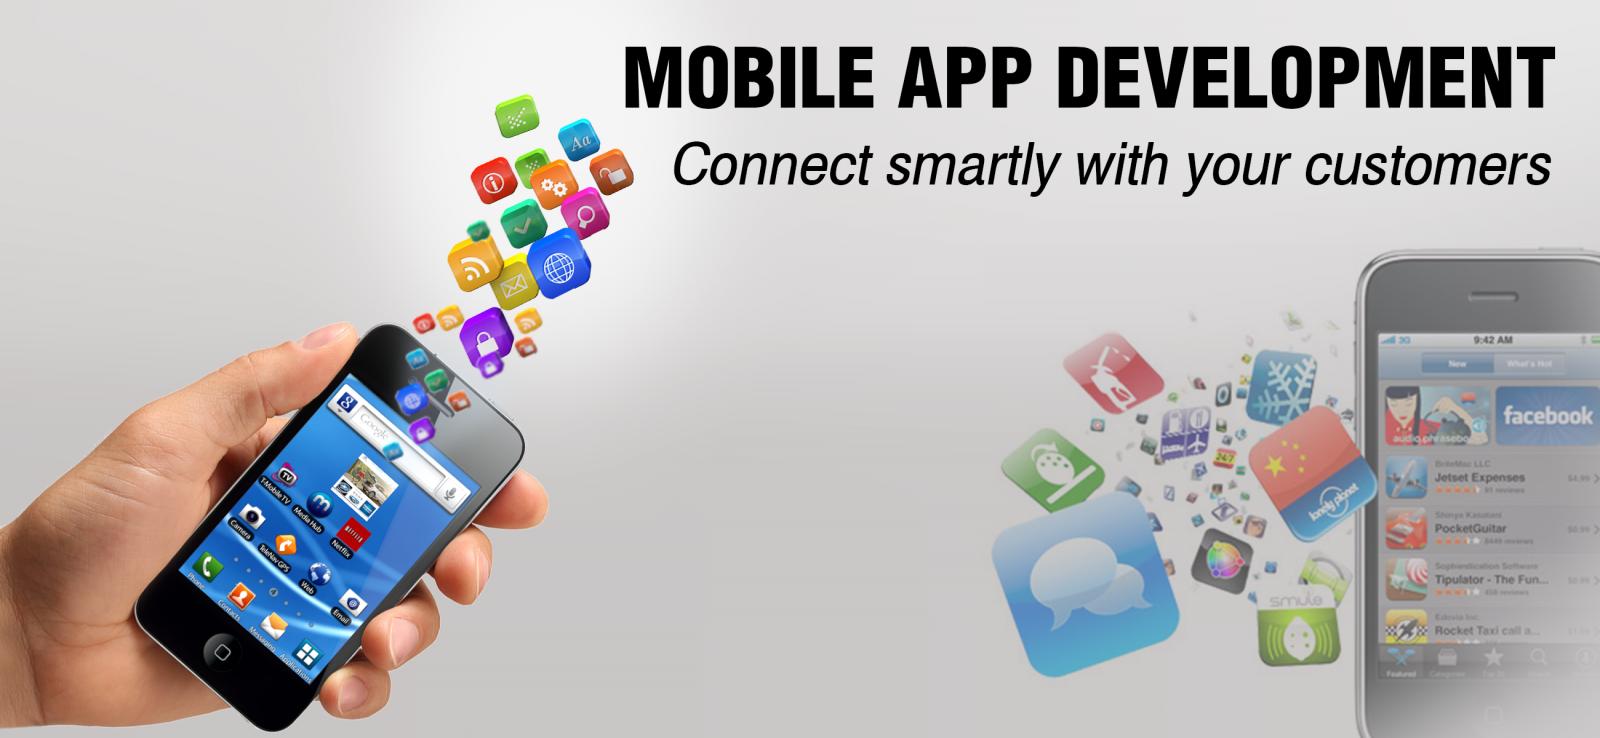 Mobile App Development 1